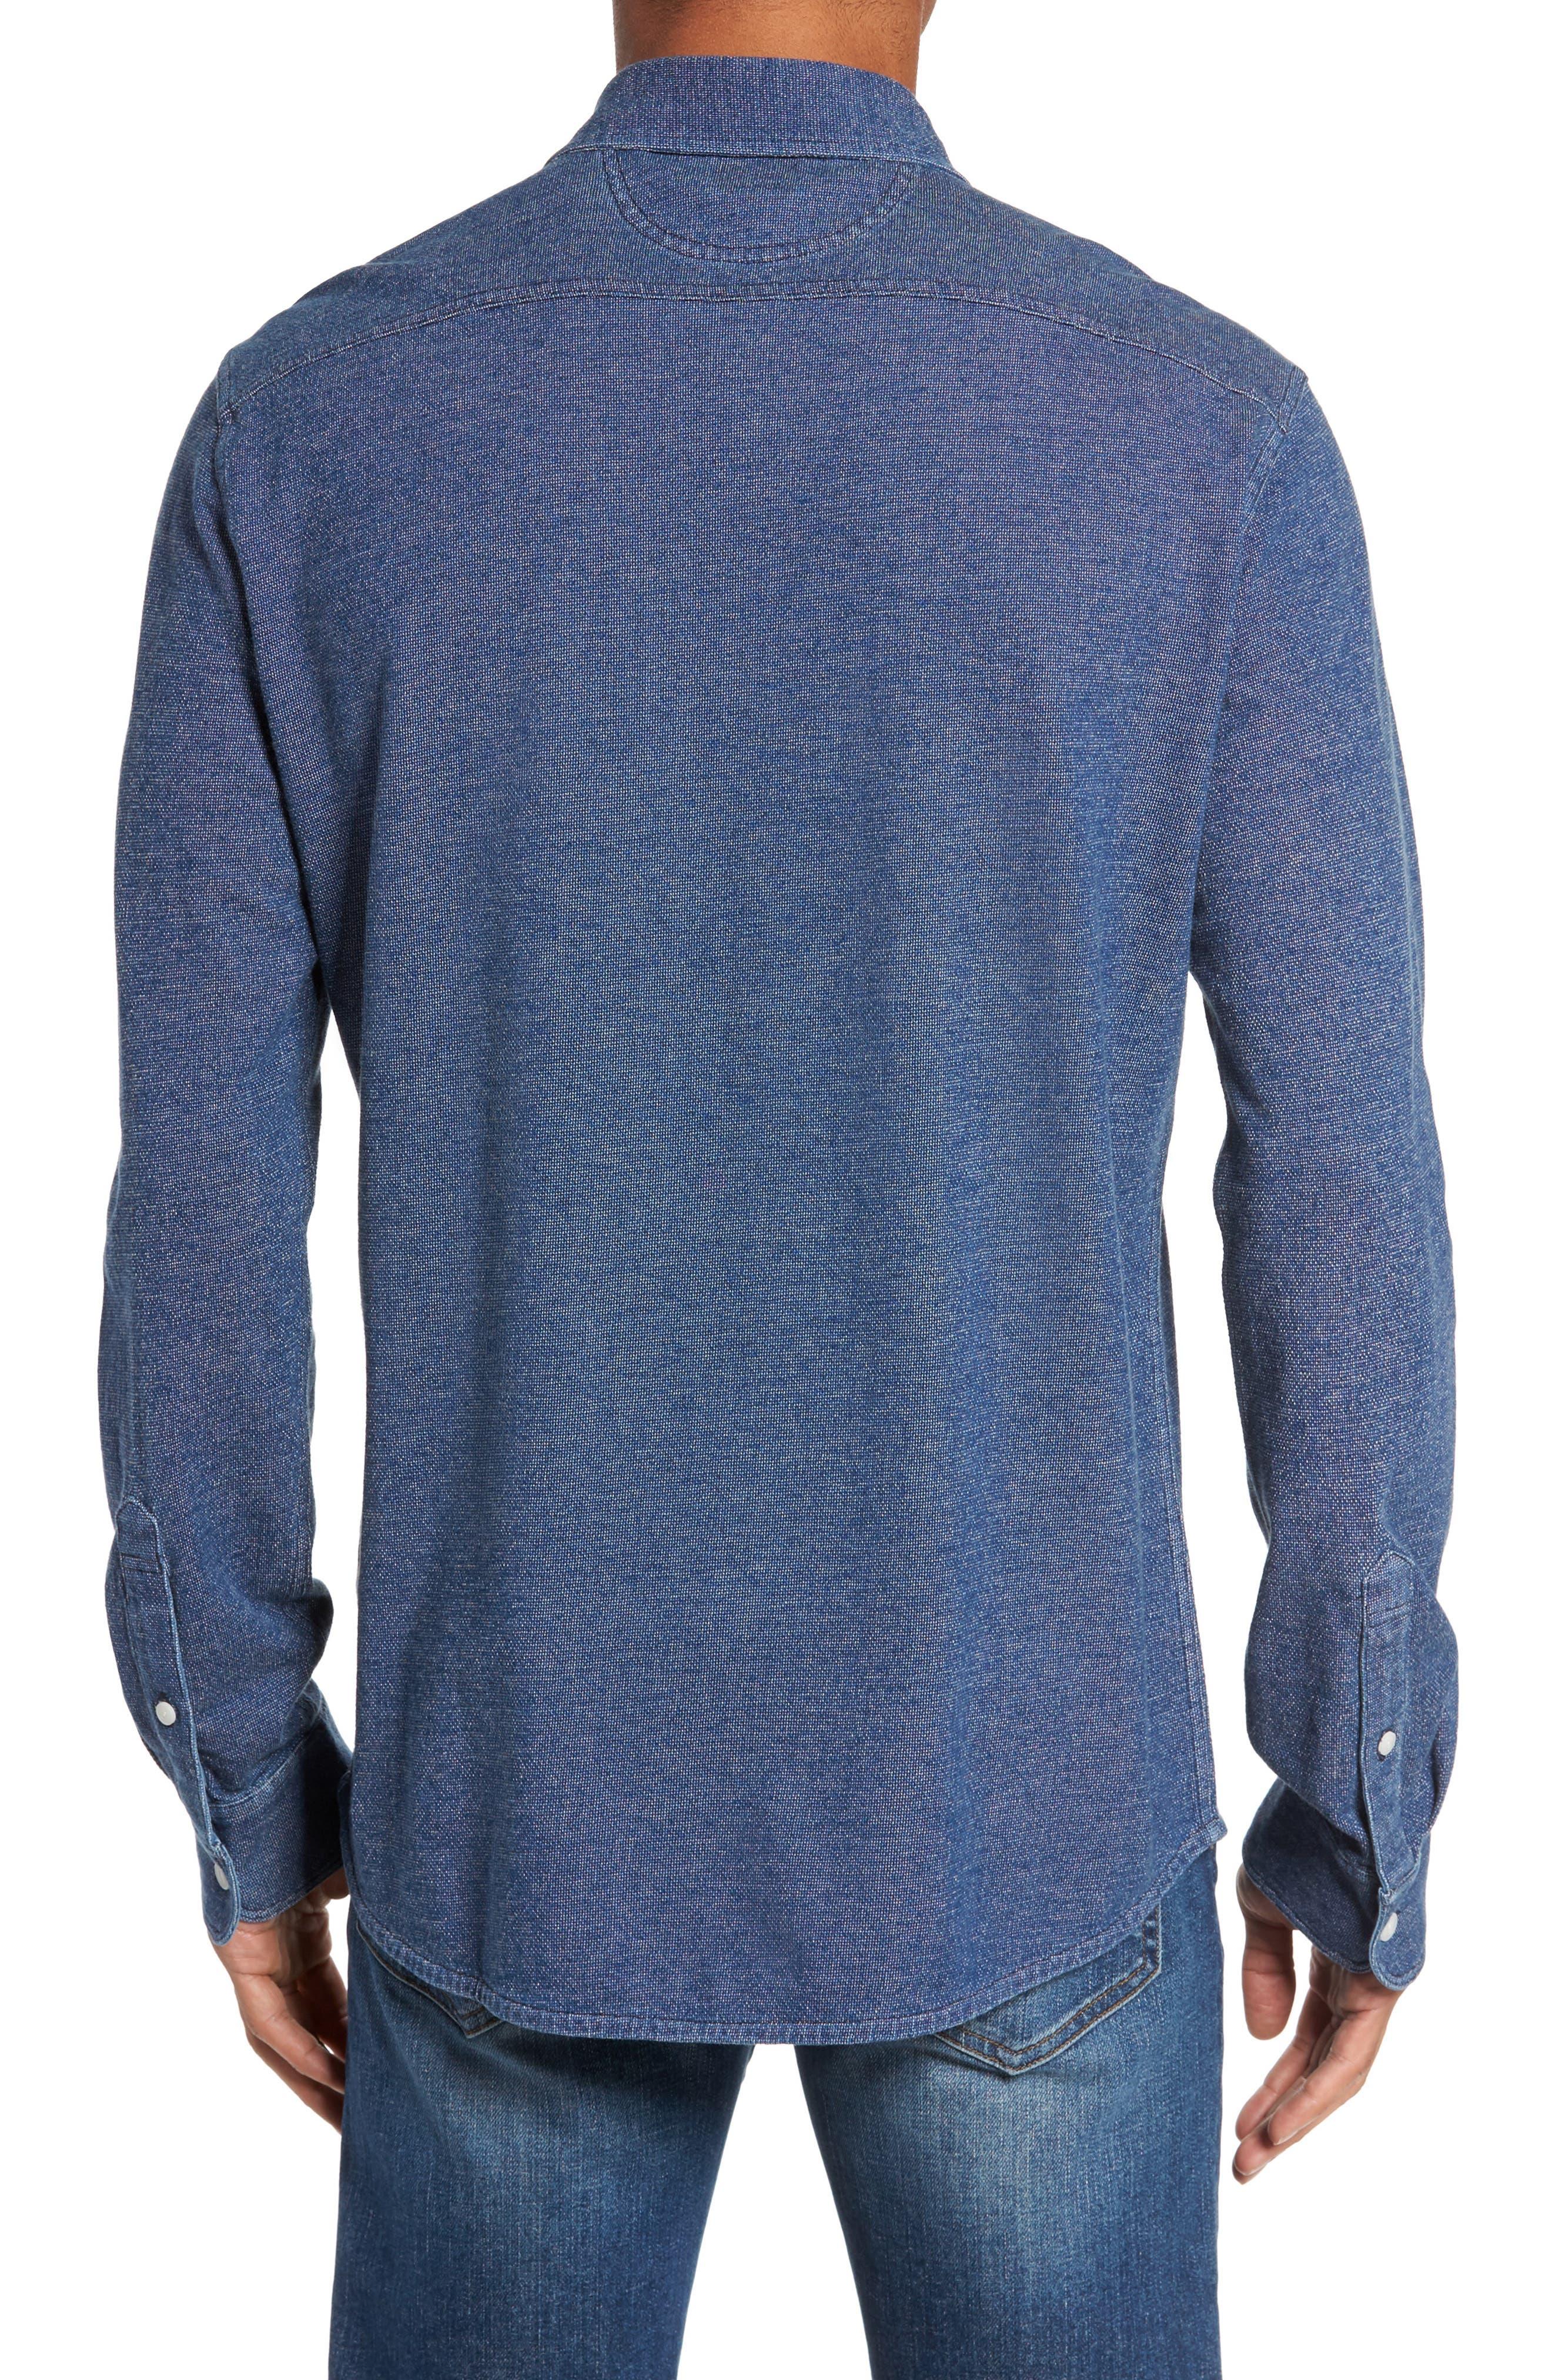 Belmar Knit Sport Shirt,                             Alternate thumbnail 2, color,                             404